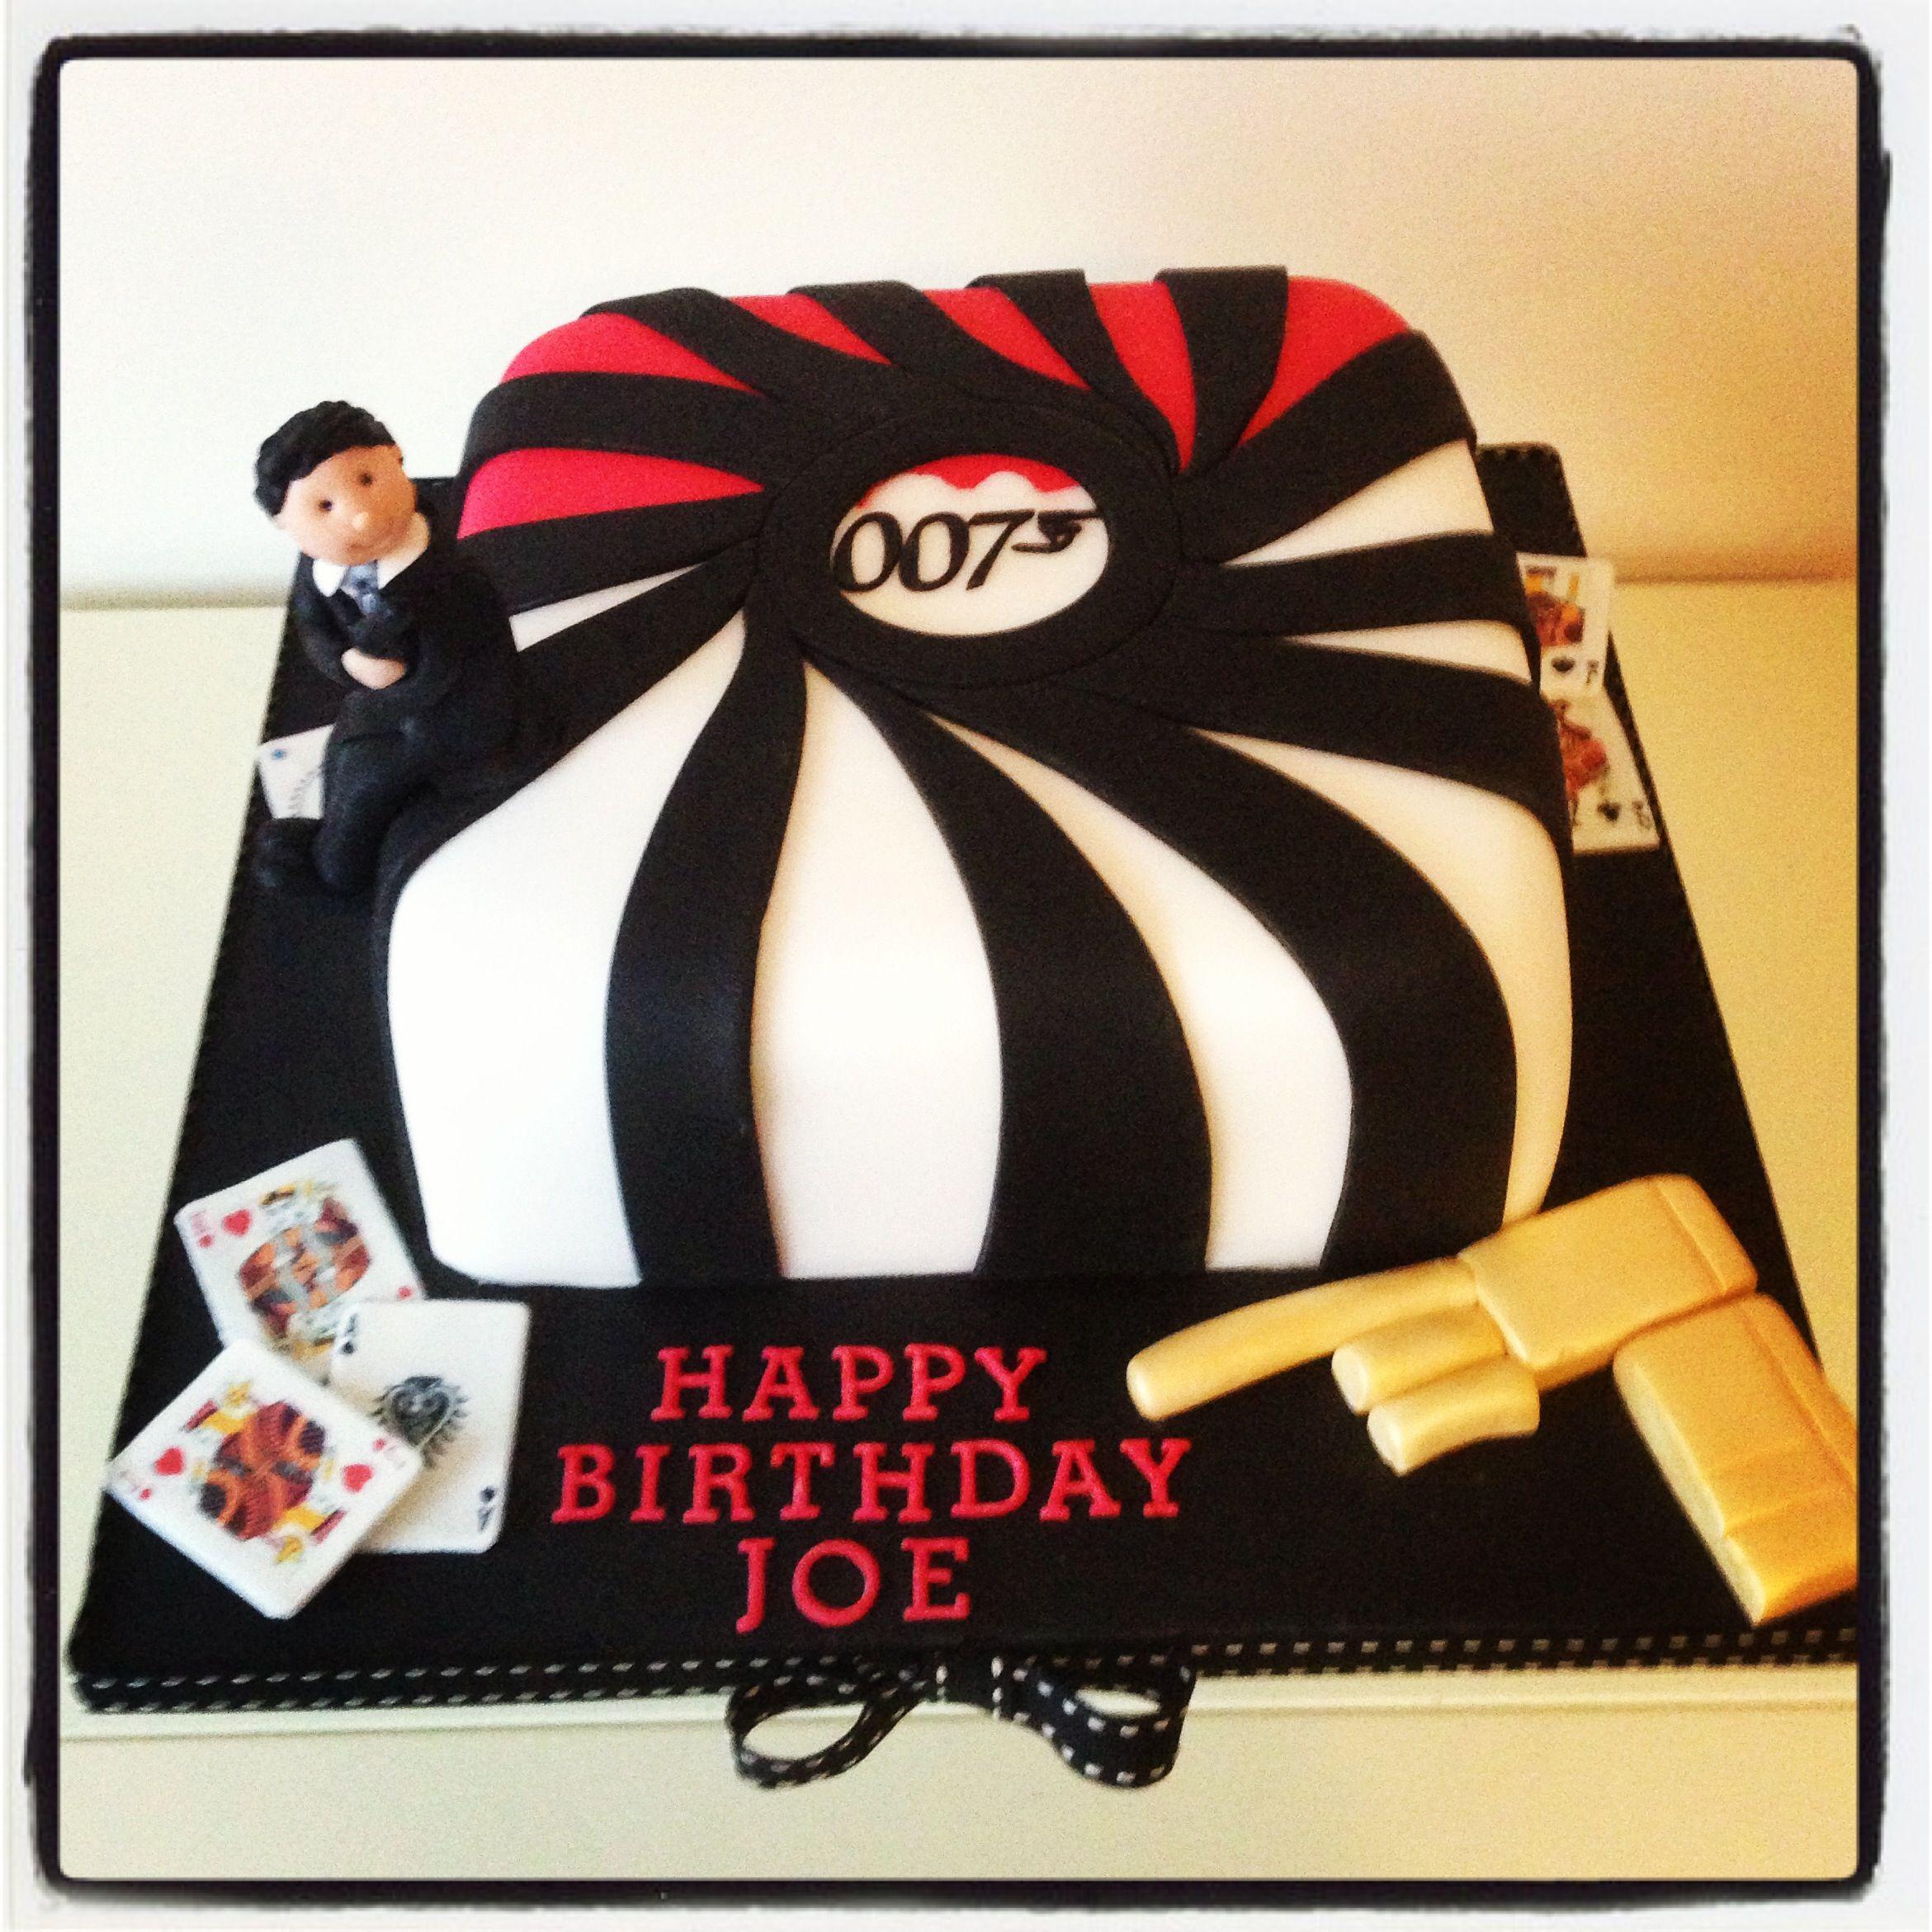 James Bond 007 Themed Birthday Cake From Www Somethingfancy Co Uk